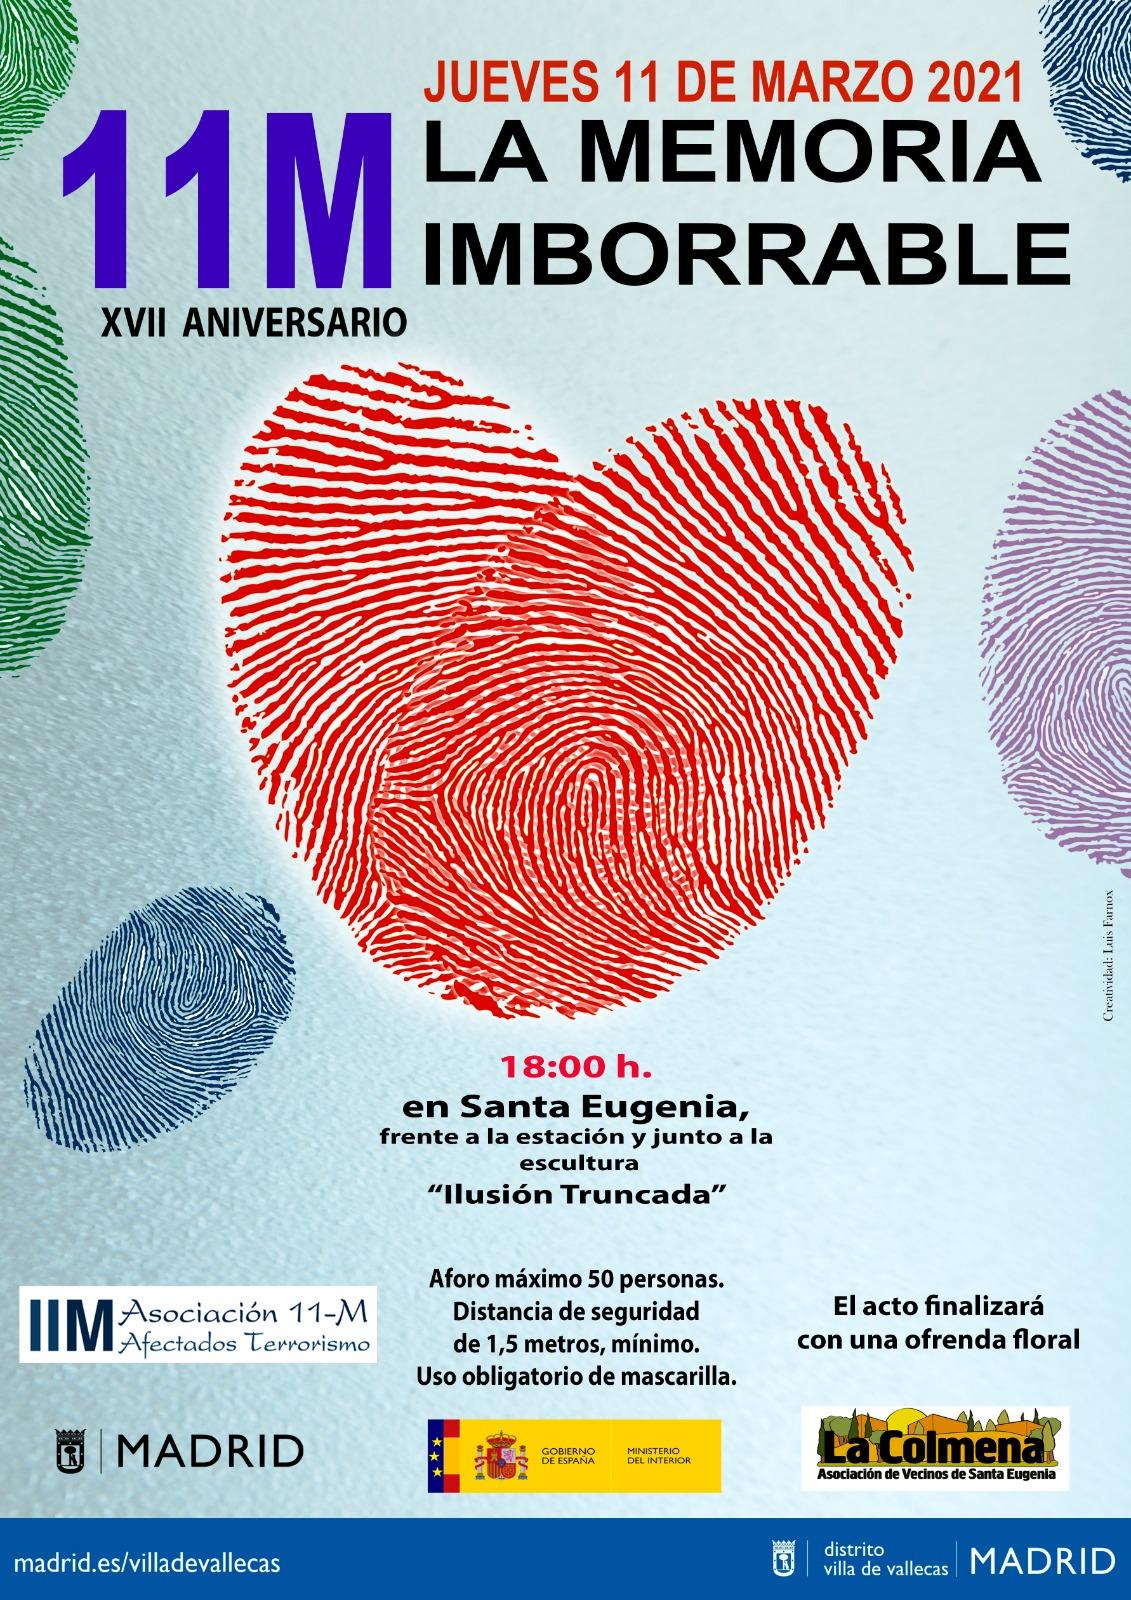 11M La Memoria Imborrable, Santa Eugenia